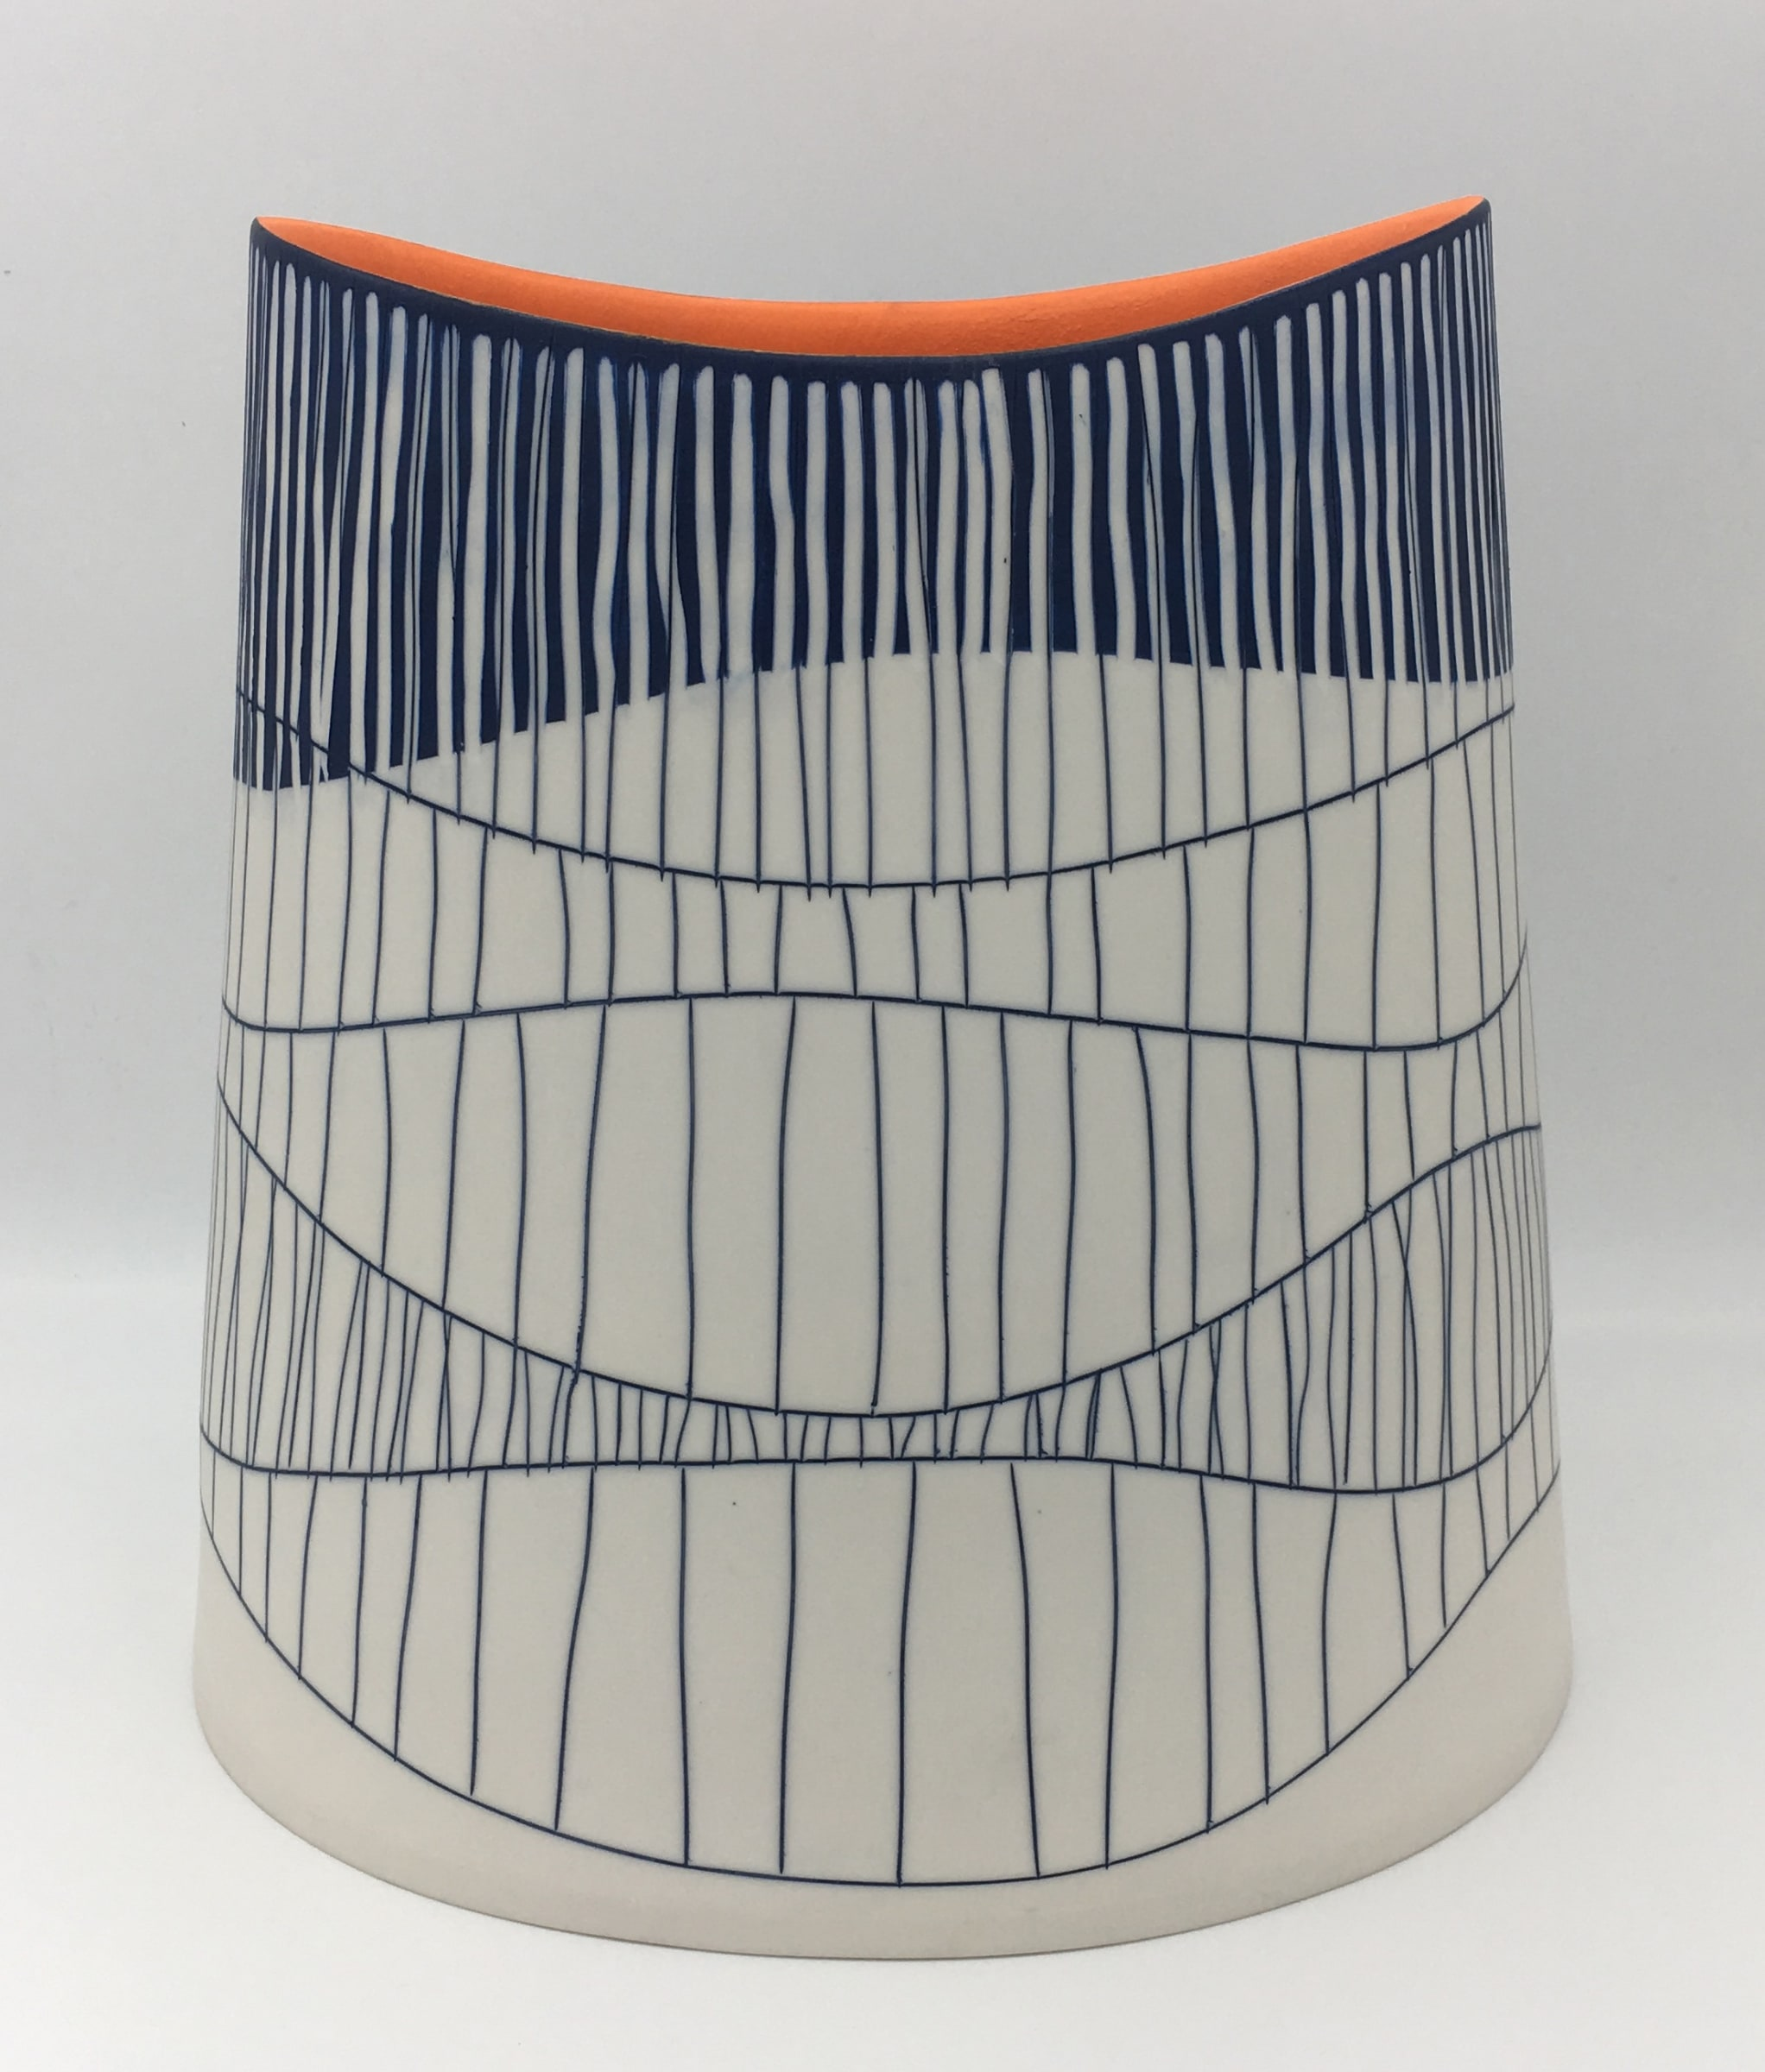 "<span class=""link fancybox-details-link""><a href=""/artists/195-lara-scobie/works/6510-lara-scobie-large-oval-vessel-with-orange-interior-2019/"">View Detail Page</a></span><div class=""artist""><strong>Lara Scobie</strong></div> b. 1967 <div class=""title""><em>Large Oval Vessel with Orange Interior</em>, 2019</div> <div class=""medium"">Porcelain</div><div class=""copyright_line"">Own Art: £95 x 10 Months, 0% APR</div>"